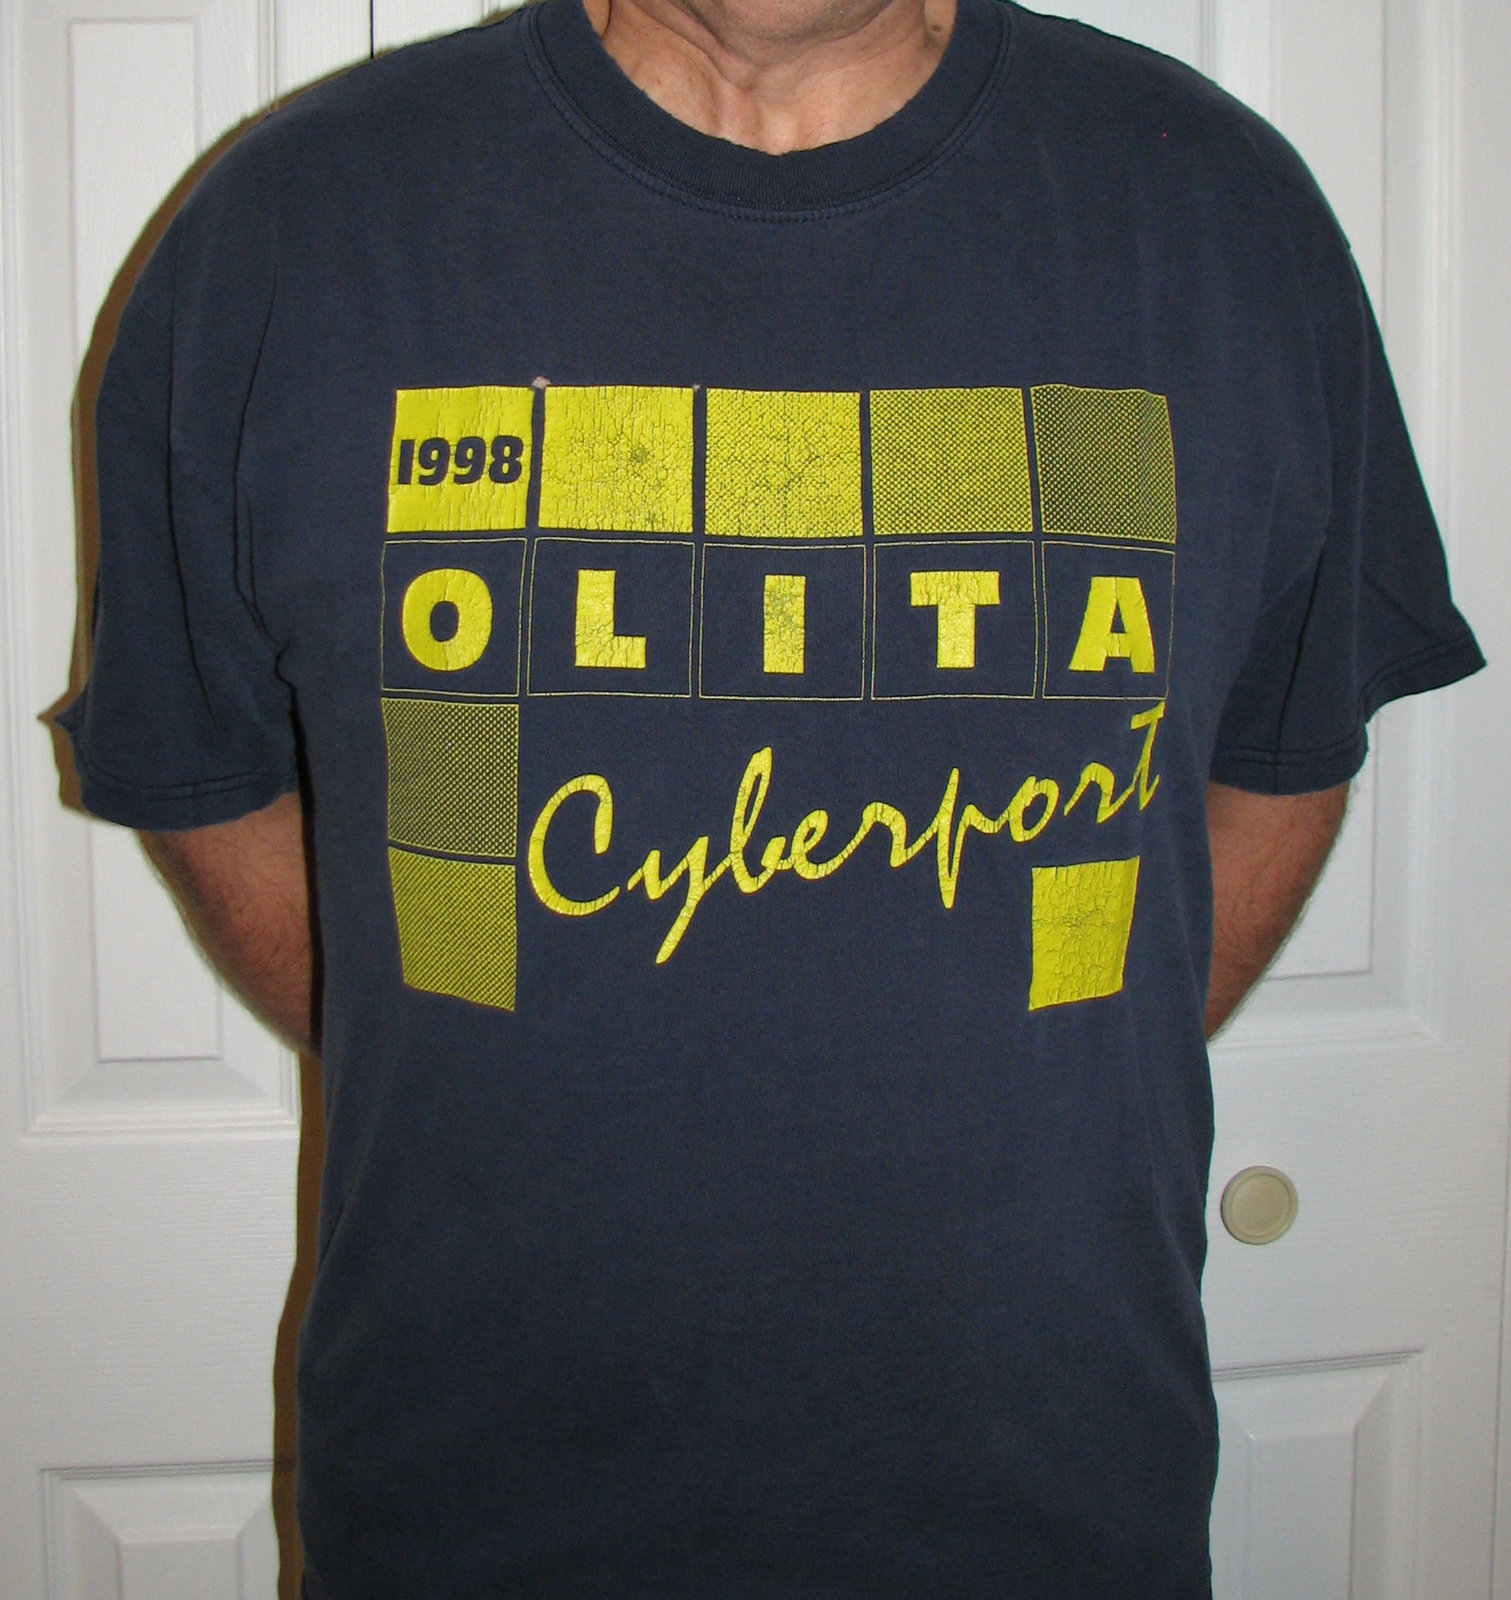 OLITA Cyberport 1998 Guide tshirt